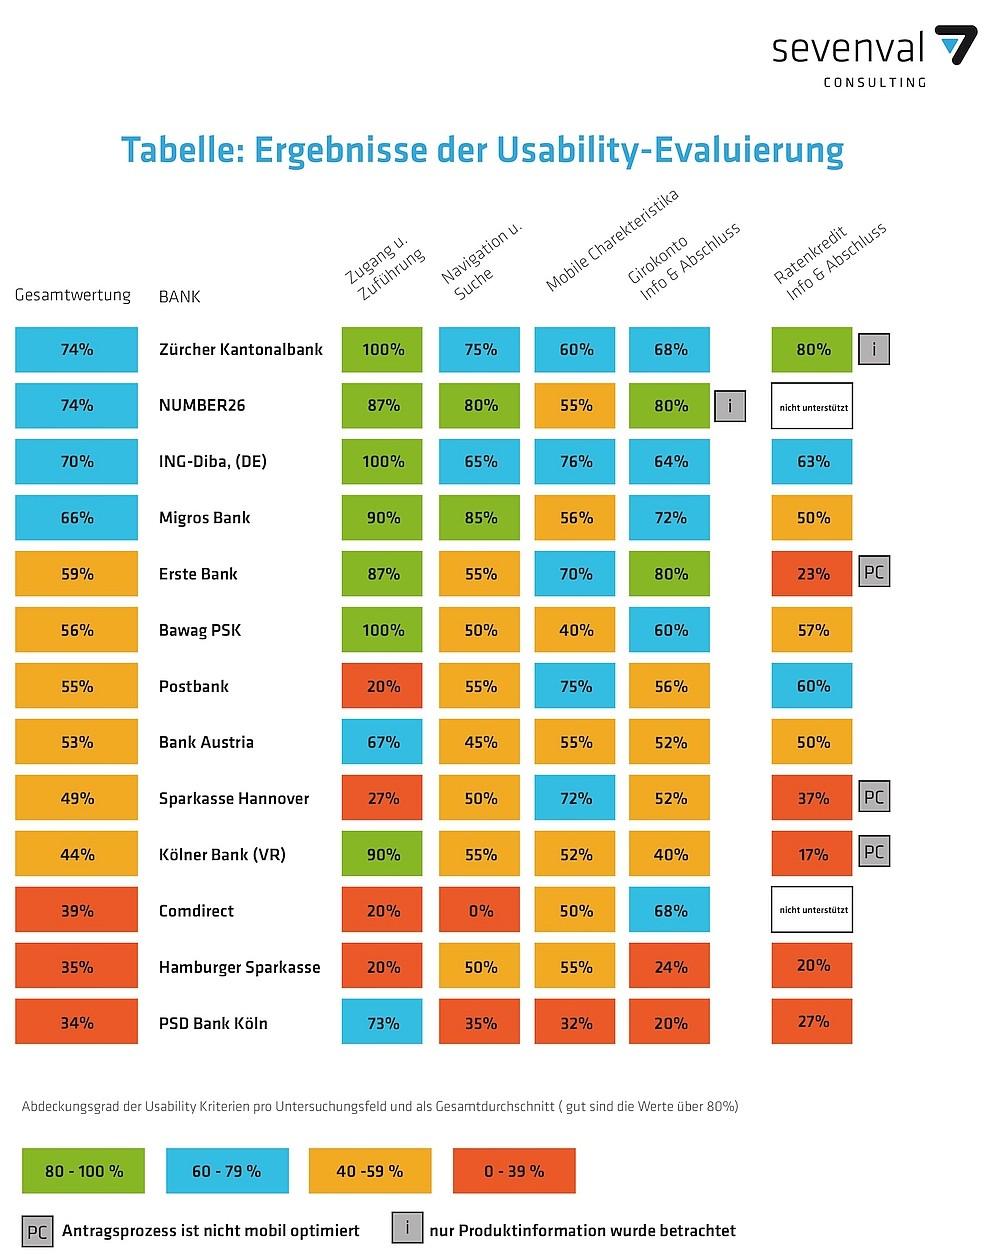 grafik sevenal banken mobil usability wertung